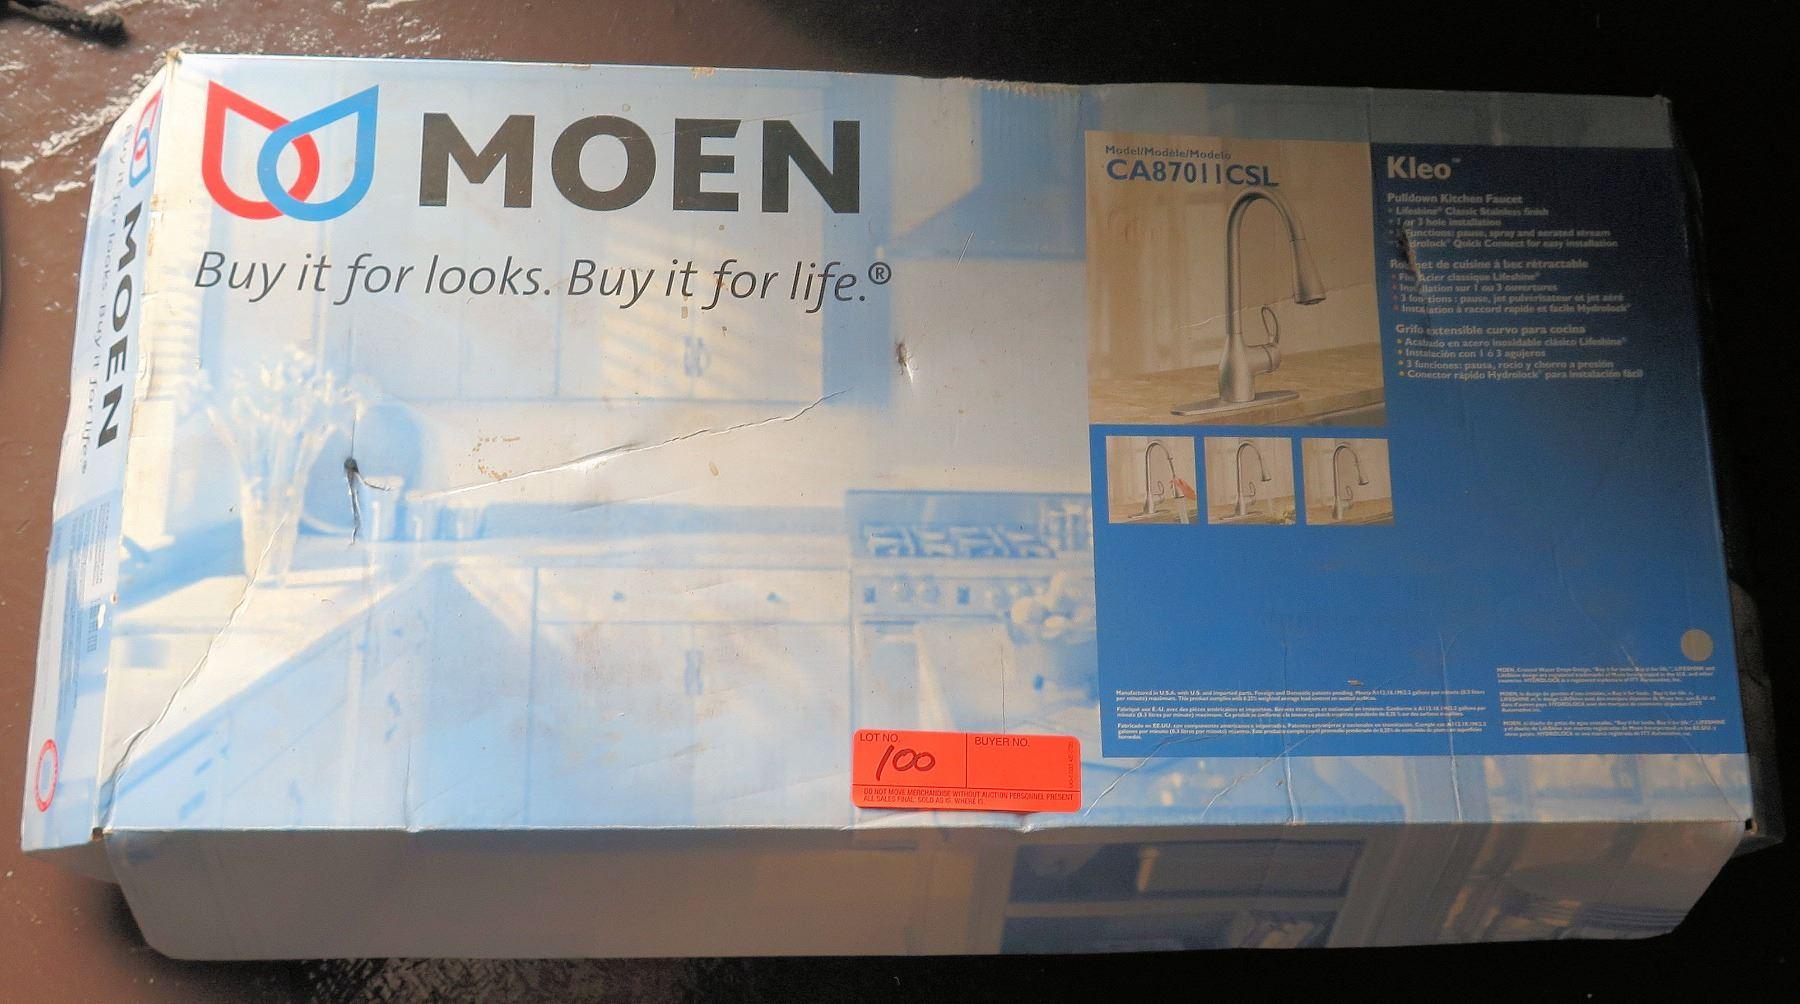 Moen Kleo Model CA87011CSL Pull Down Kitchen Faucet in Box ...